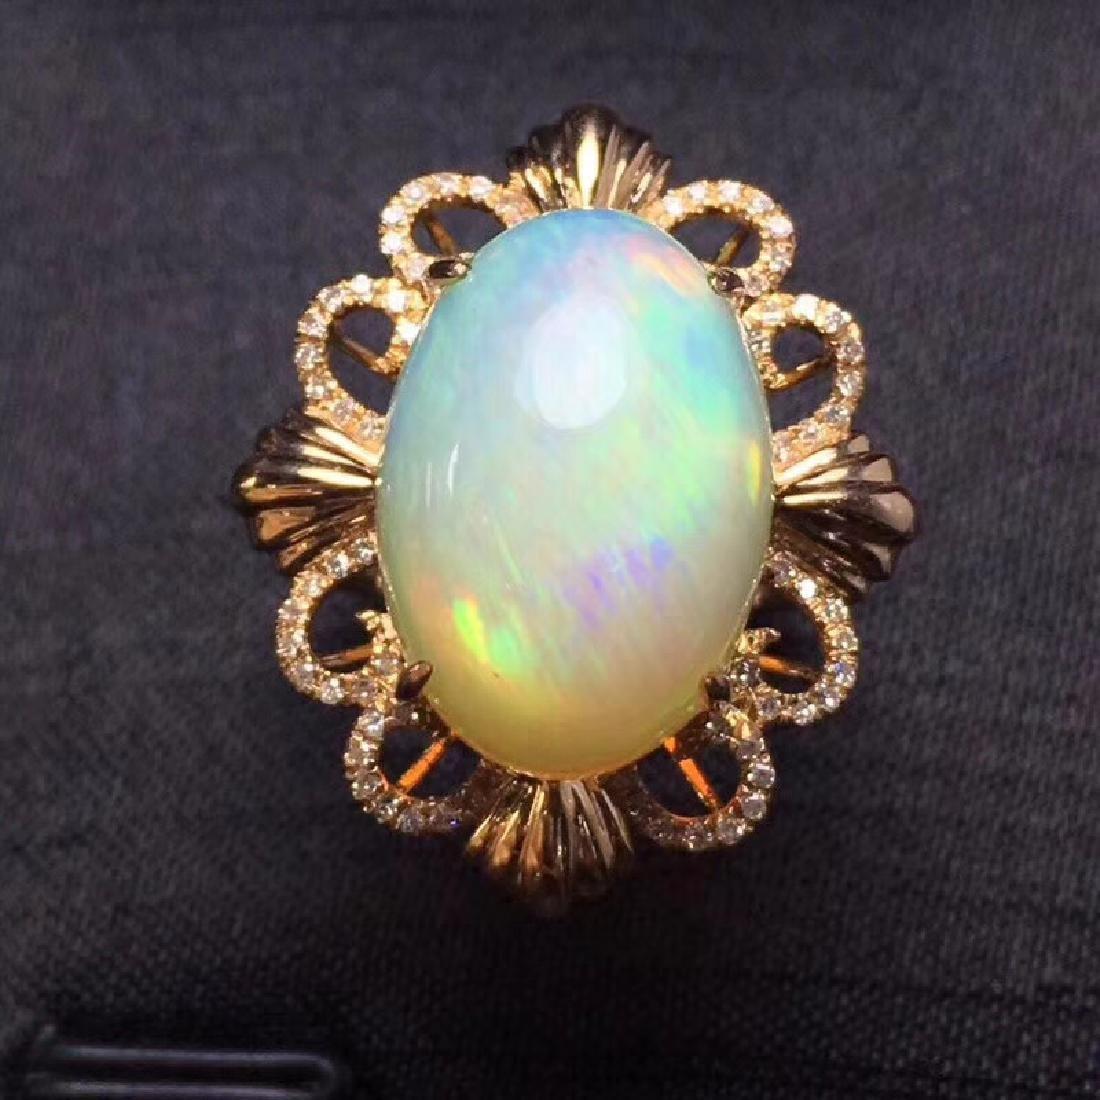 7.7 CTW Opal & VS Diamond Ring 18K